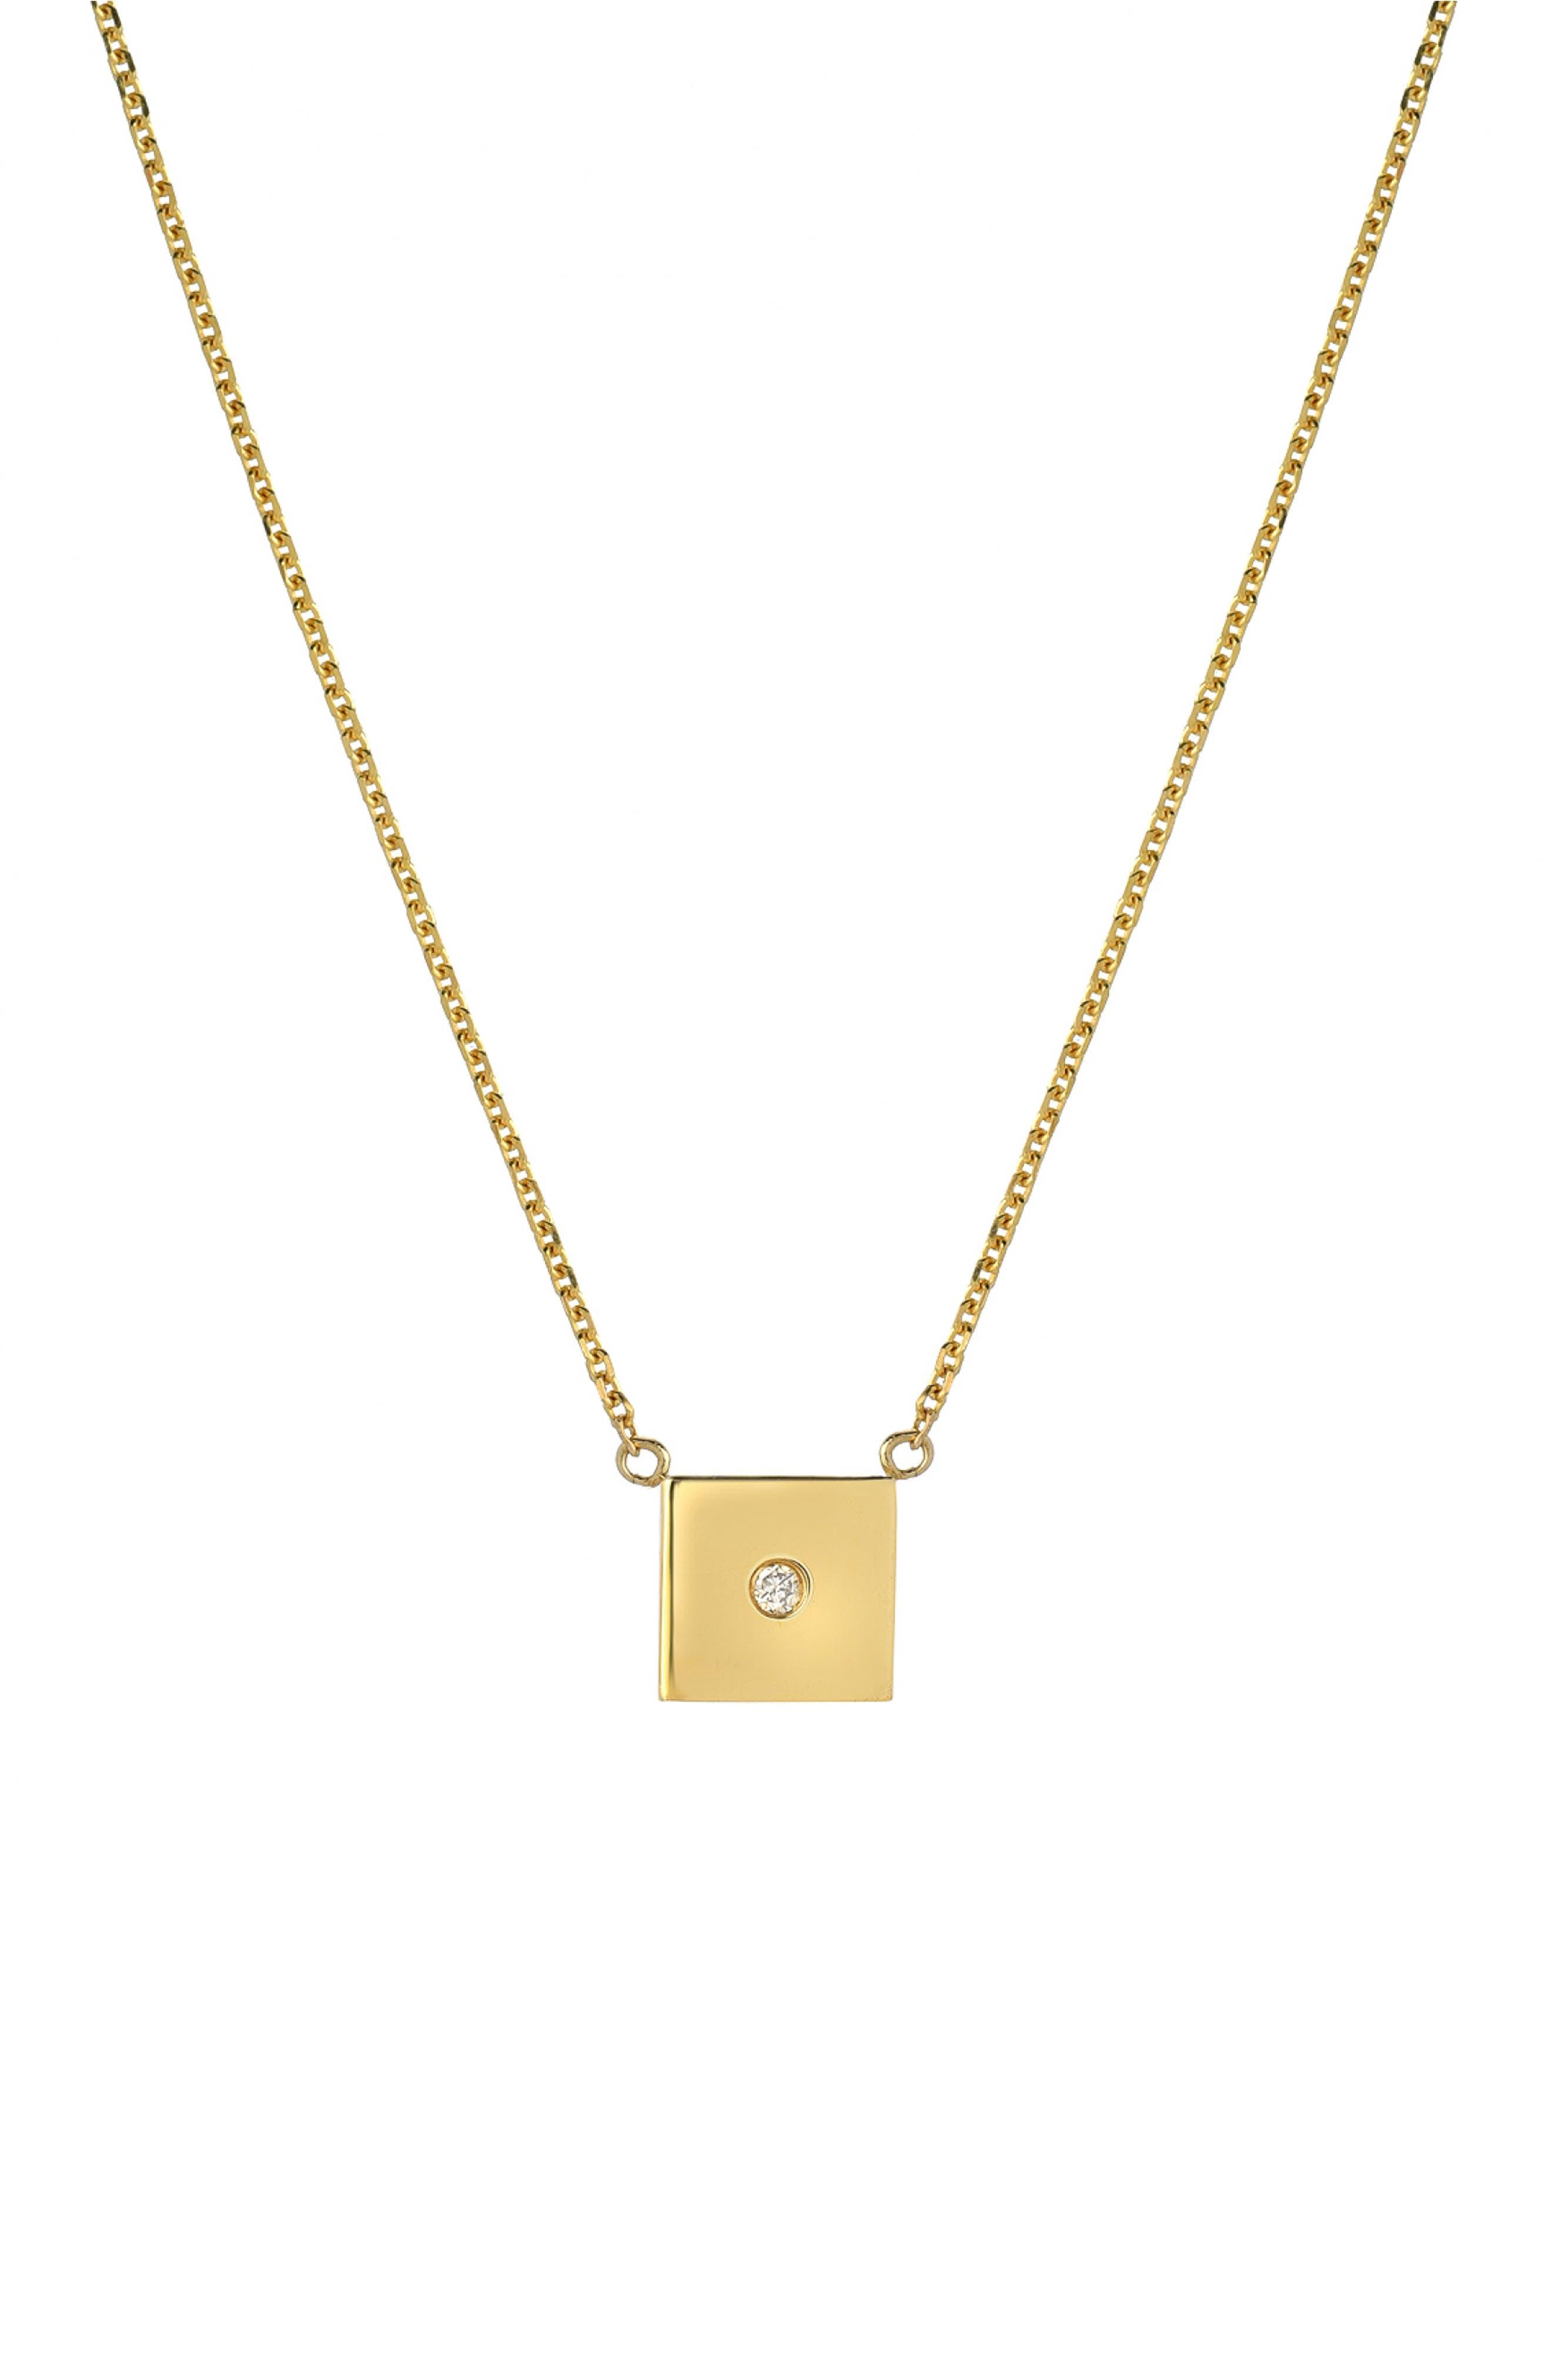 MINI MINI JEWELS,                             Forever Collection - Square Diamond Pendant Necklace,                             Main thumbnail 1, color,                             YELLOW GOLD